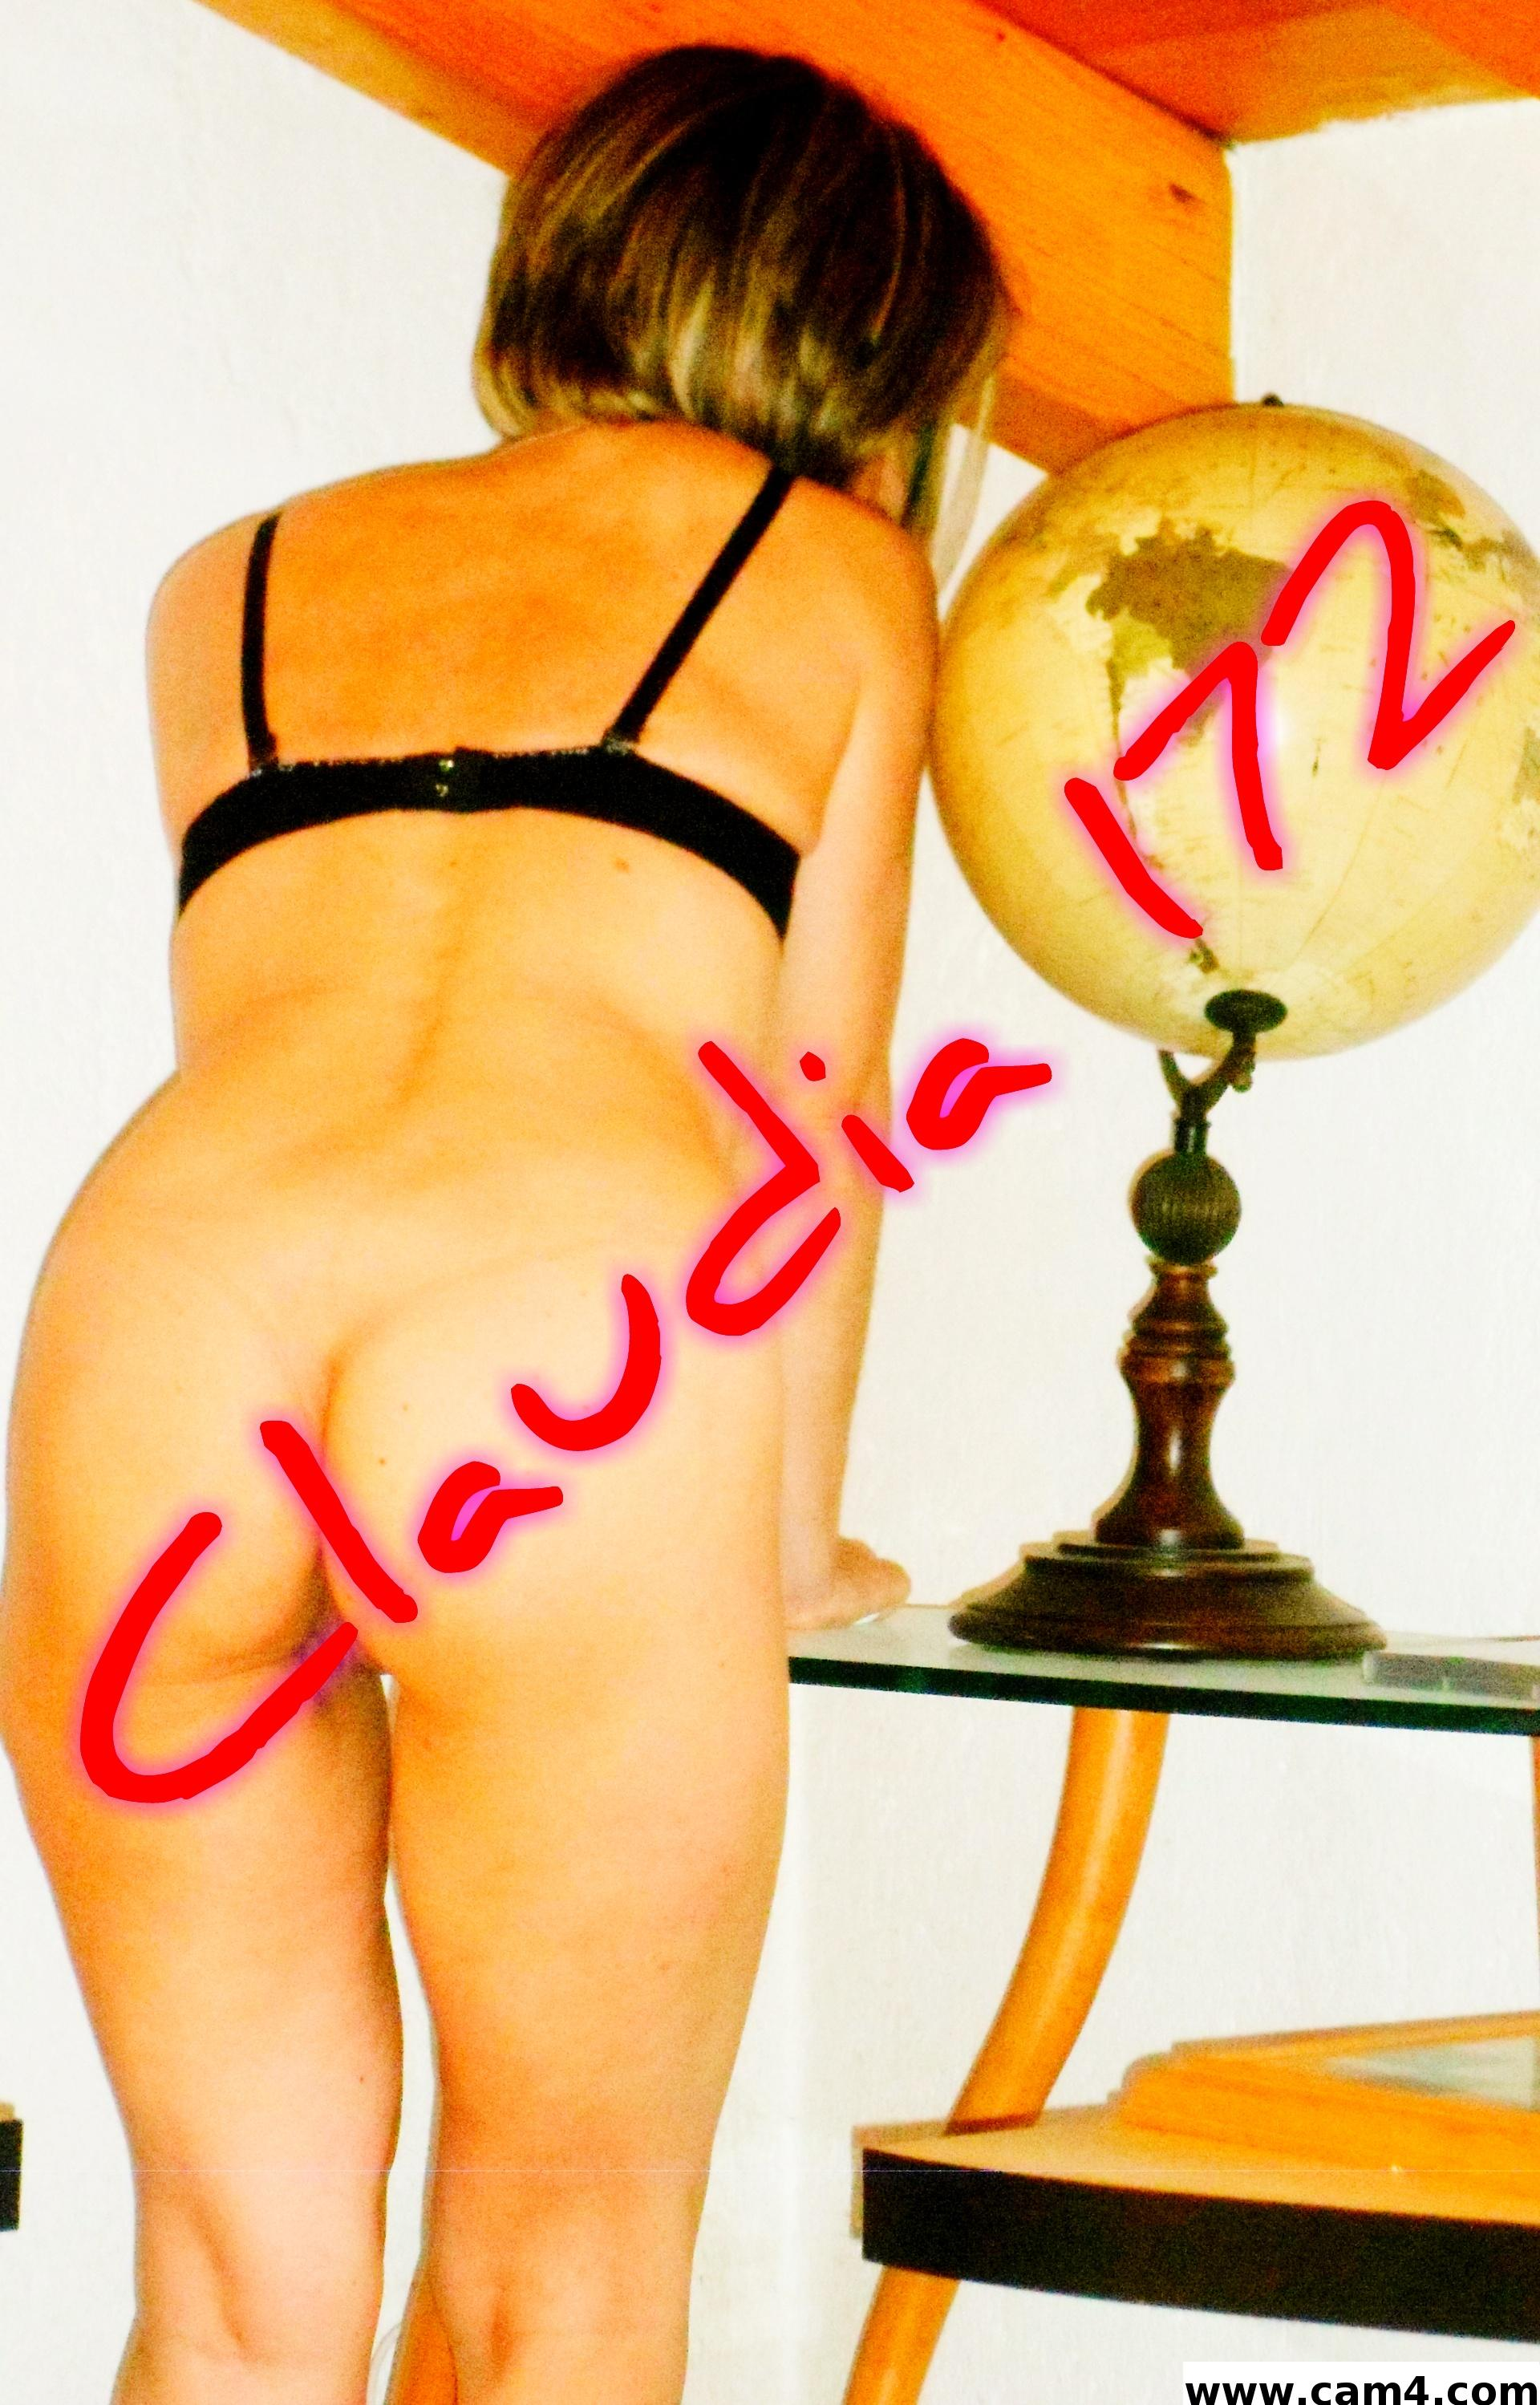 Claudia172?s=ehm15gmvn5uqowo0qrt8fkistmqrcjiqx2hazka2sx4=